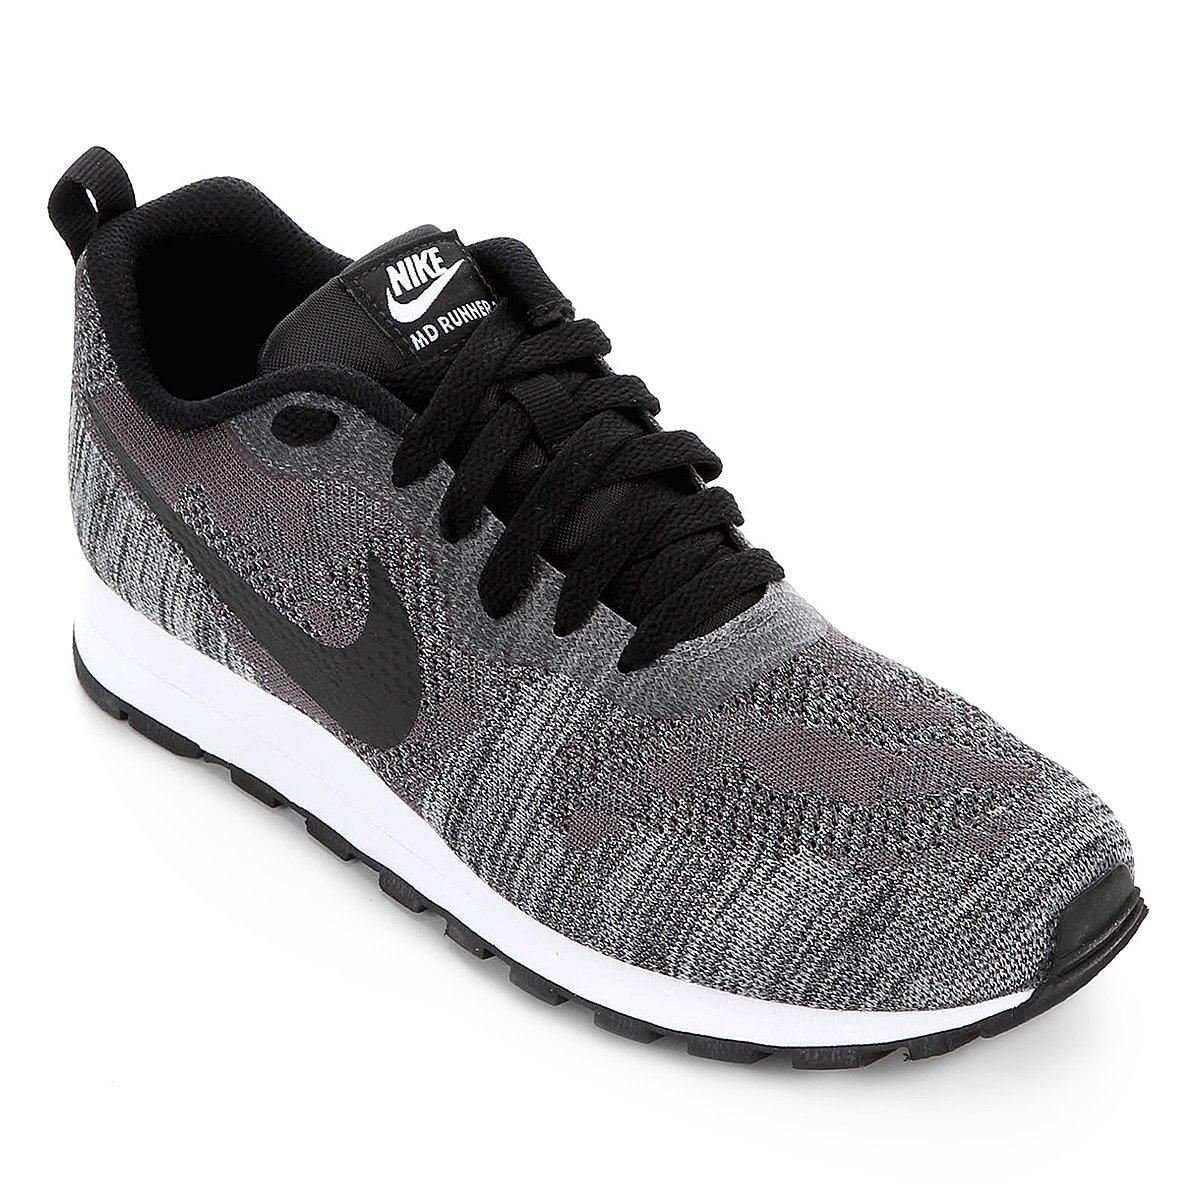 Tênis Nike Md Runner 2 19 Feminino Preto E Chumbo